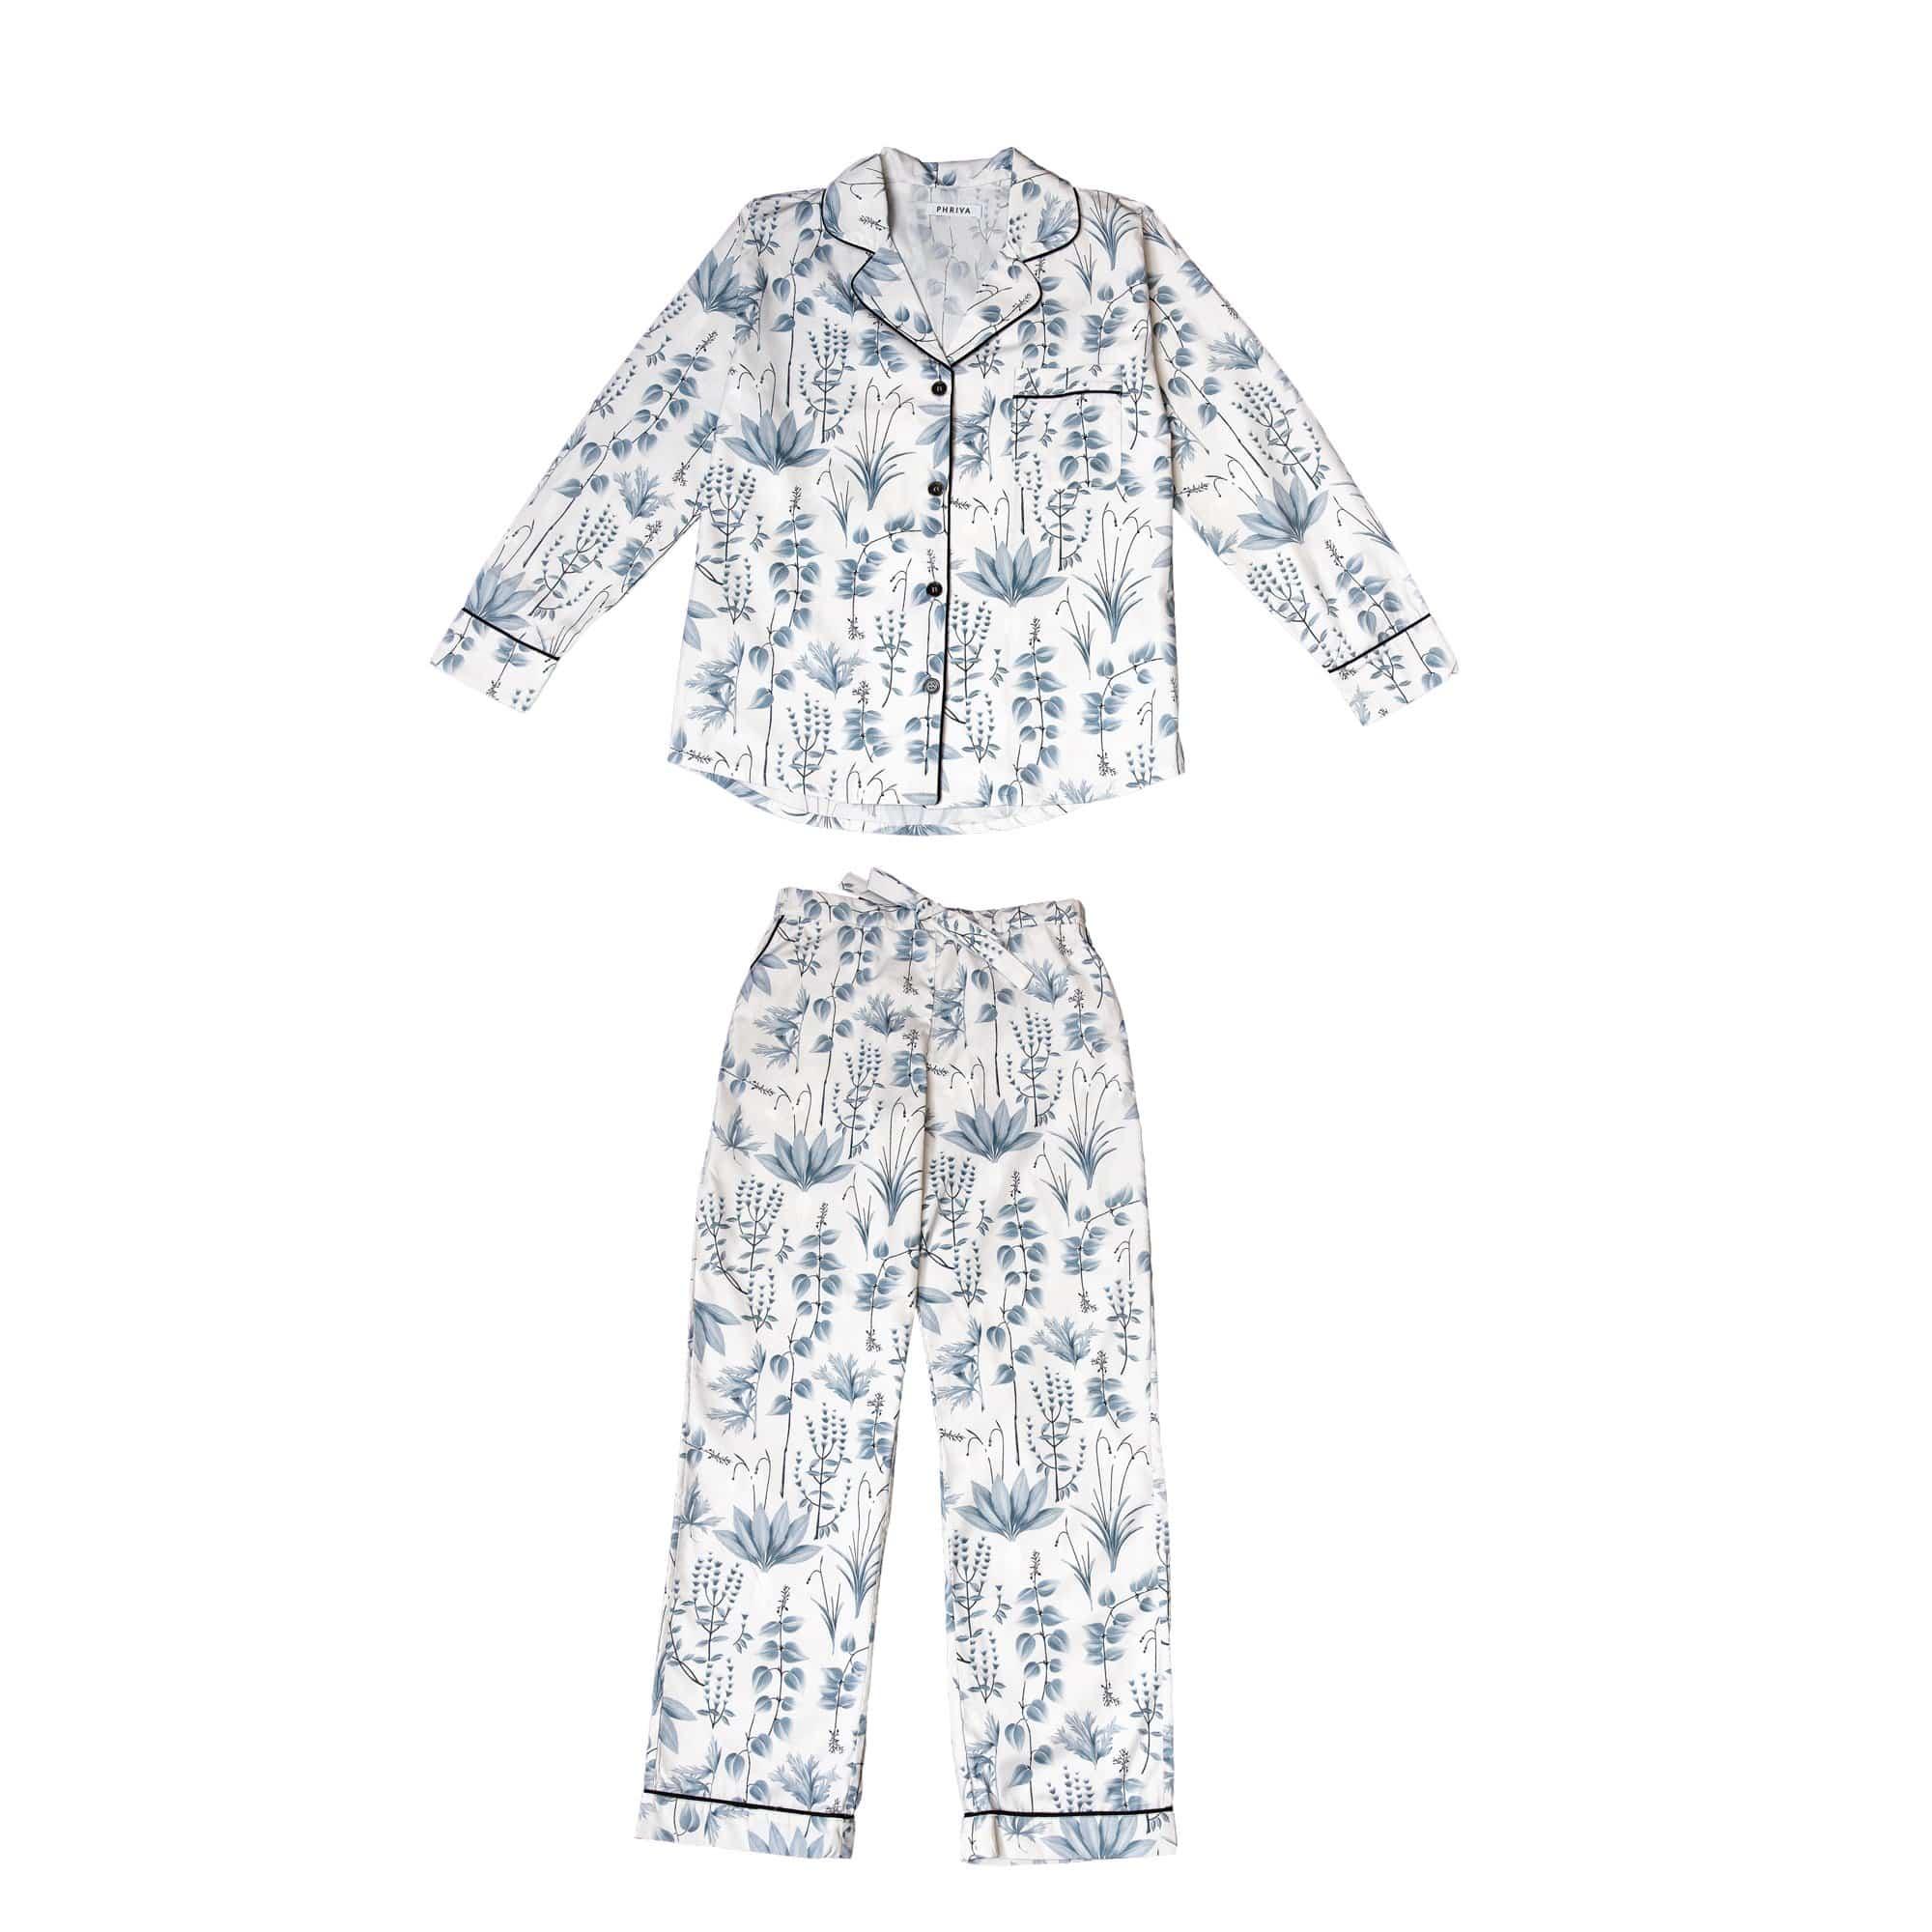 Phriya Women's Gray Circe's Garden Long Pajama Set  - multicolor - Size: One Size